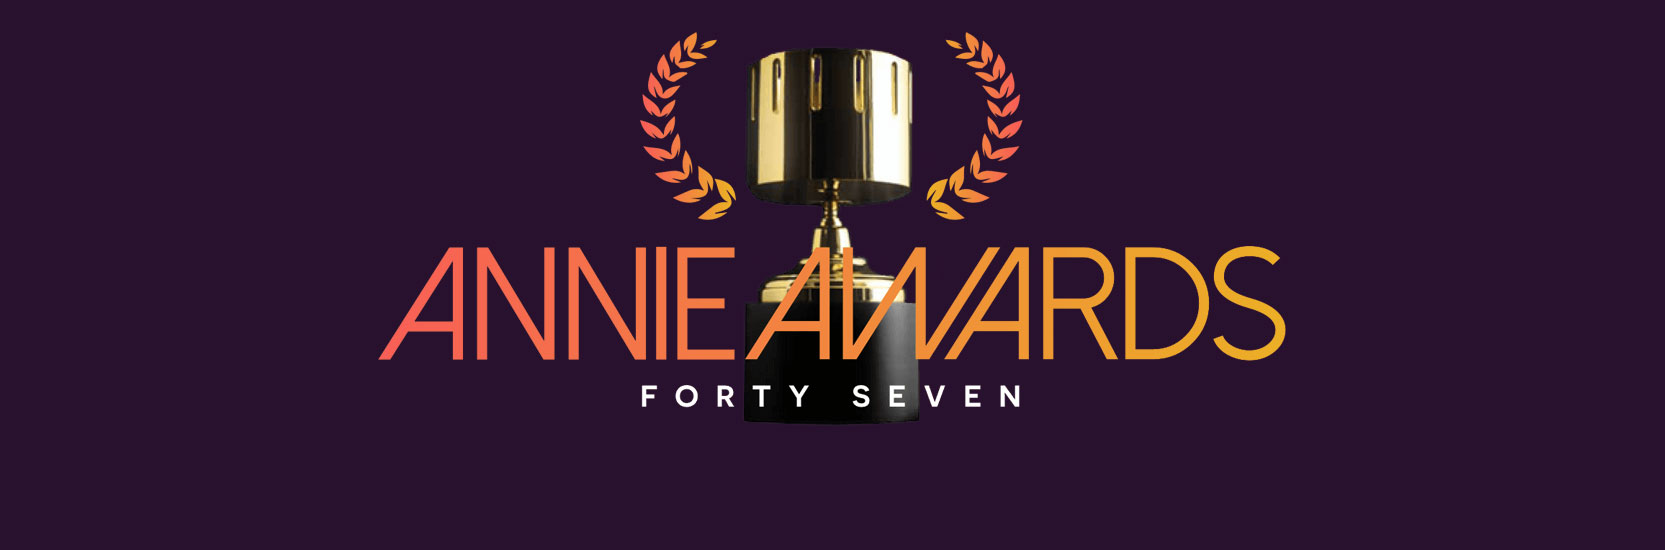 Annie Awards 47 : Noël pour Netflix !